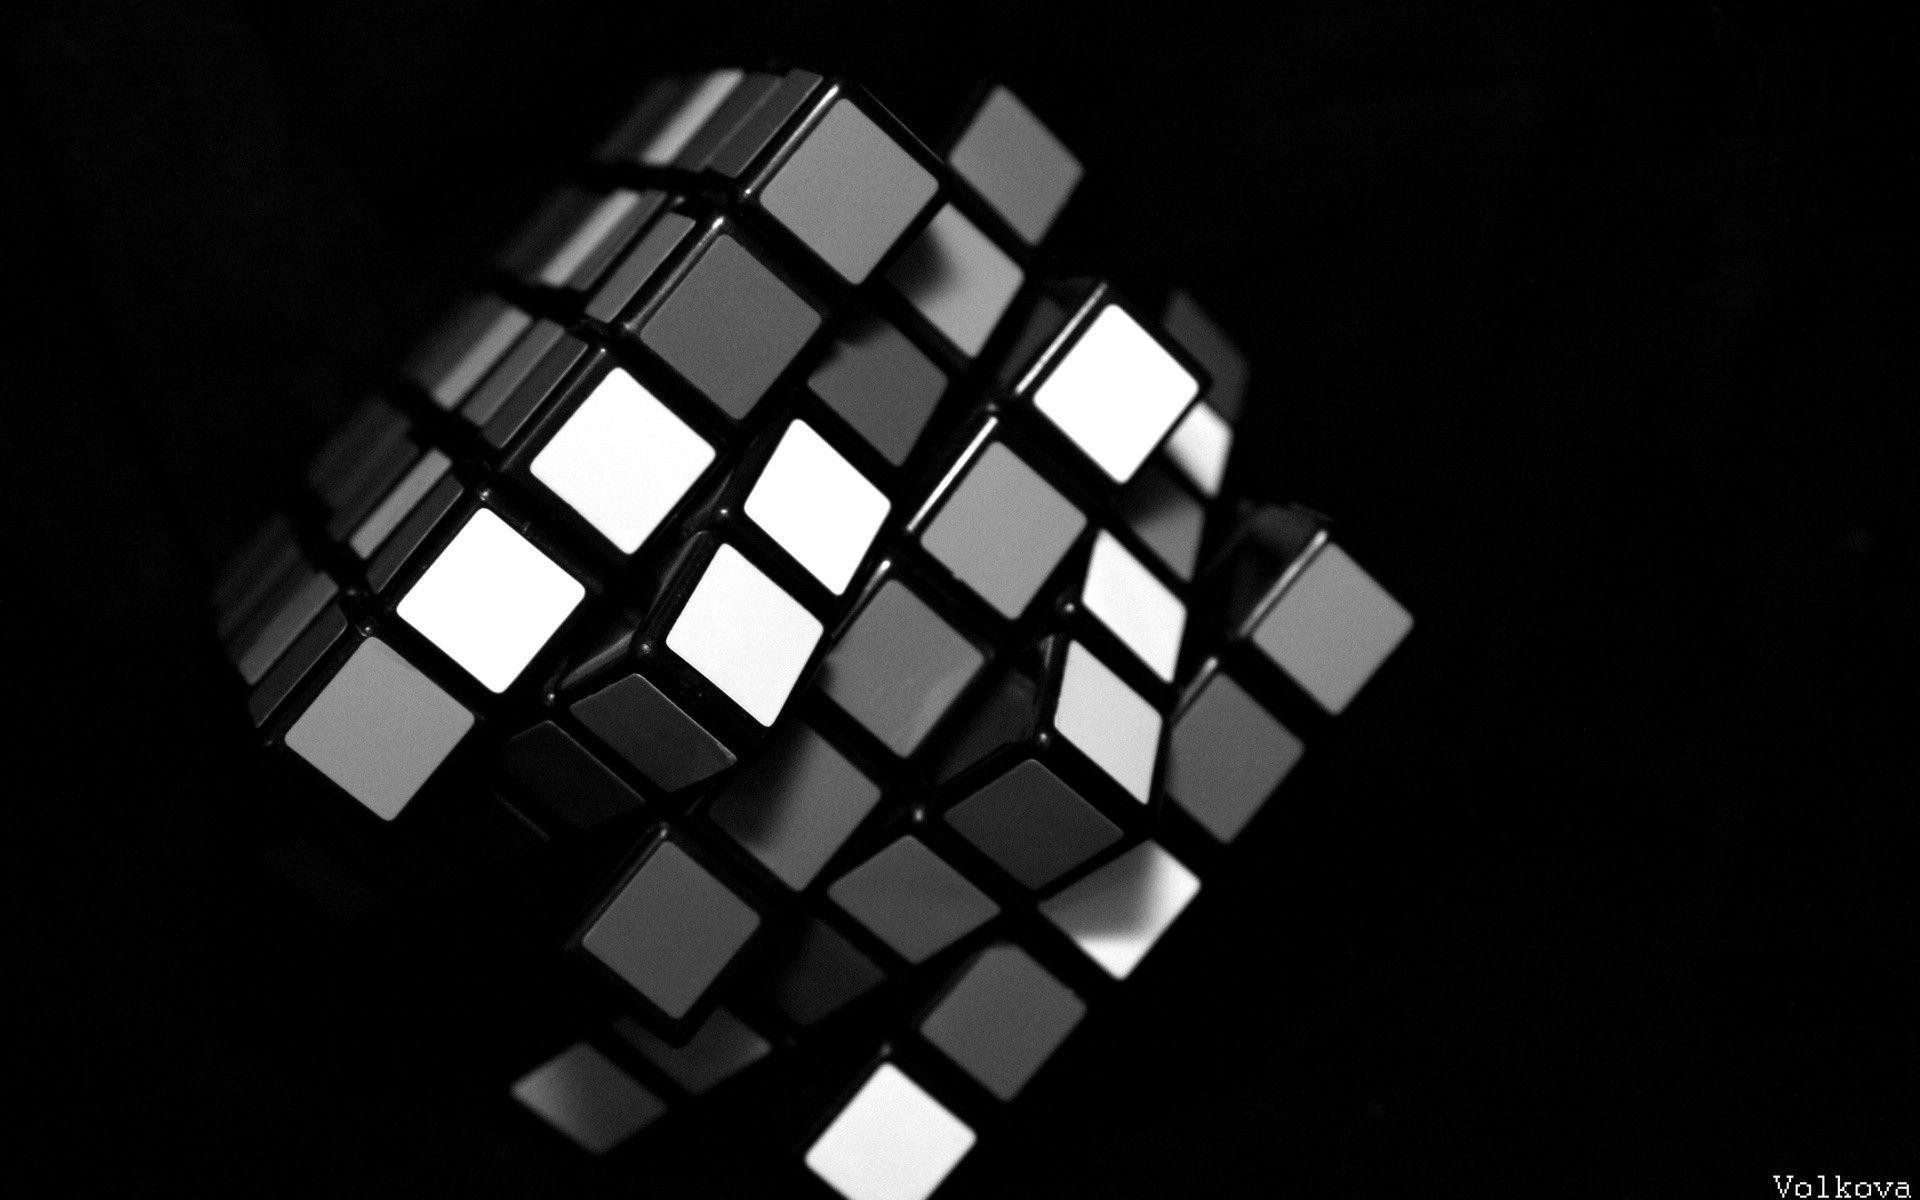 black and white computer backgrounds 61 images. Black Bedroom Furniture Sets. Home Design Ideas